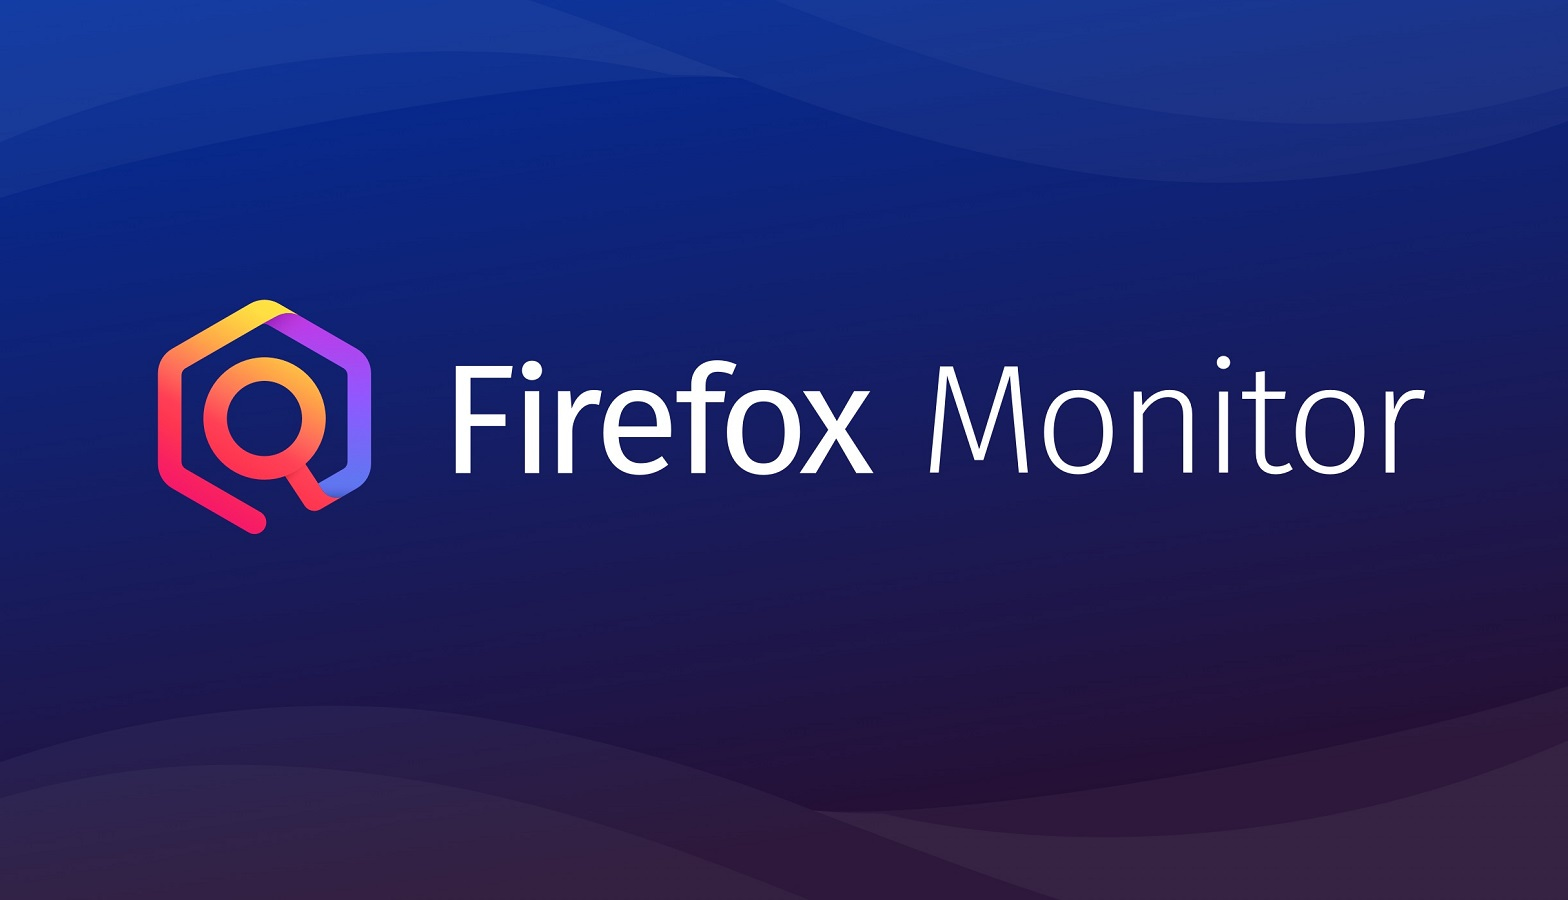 firefox monitor logo data breach